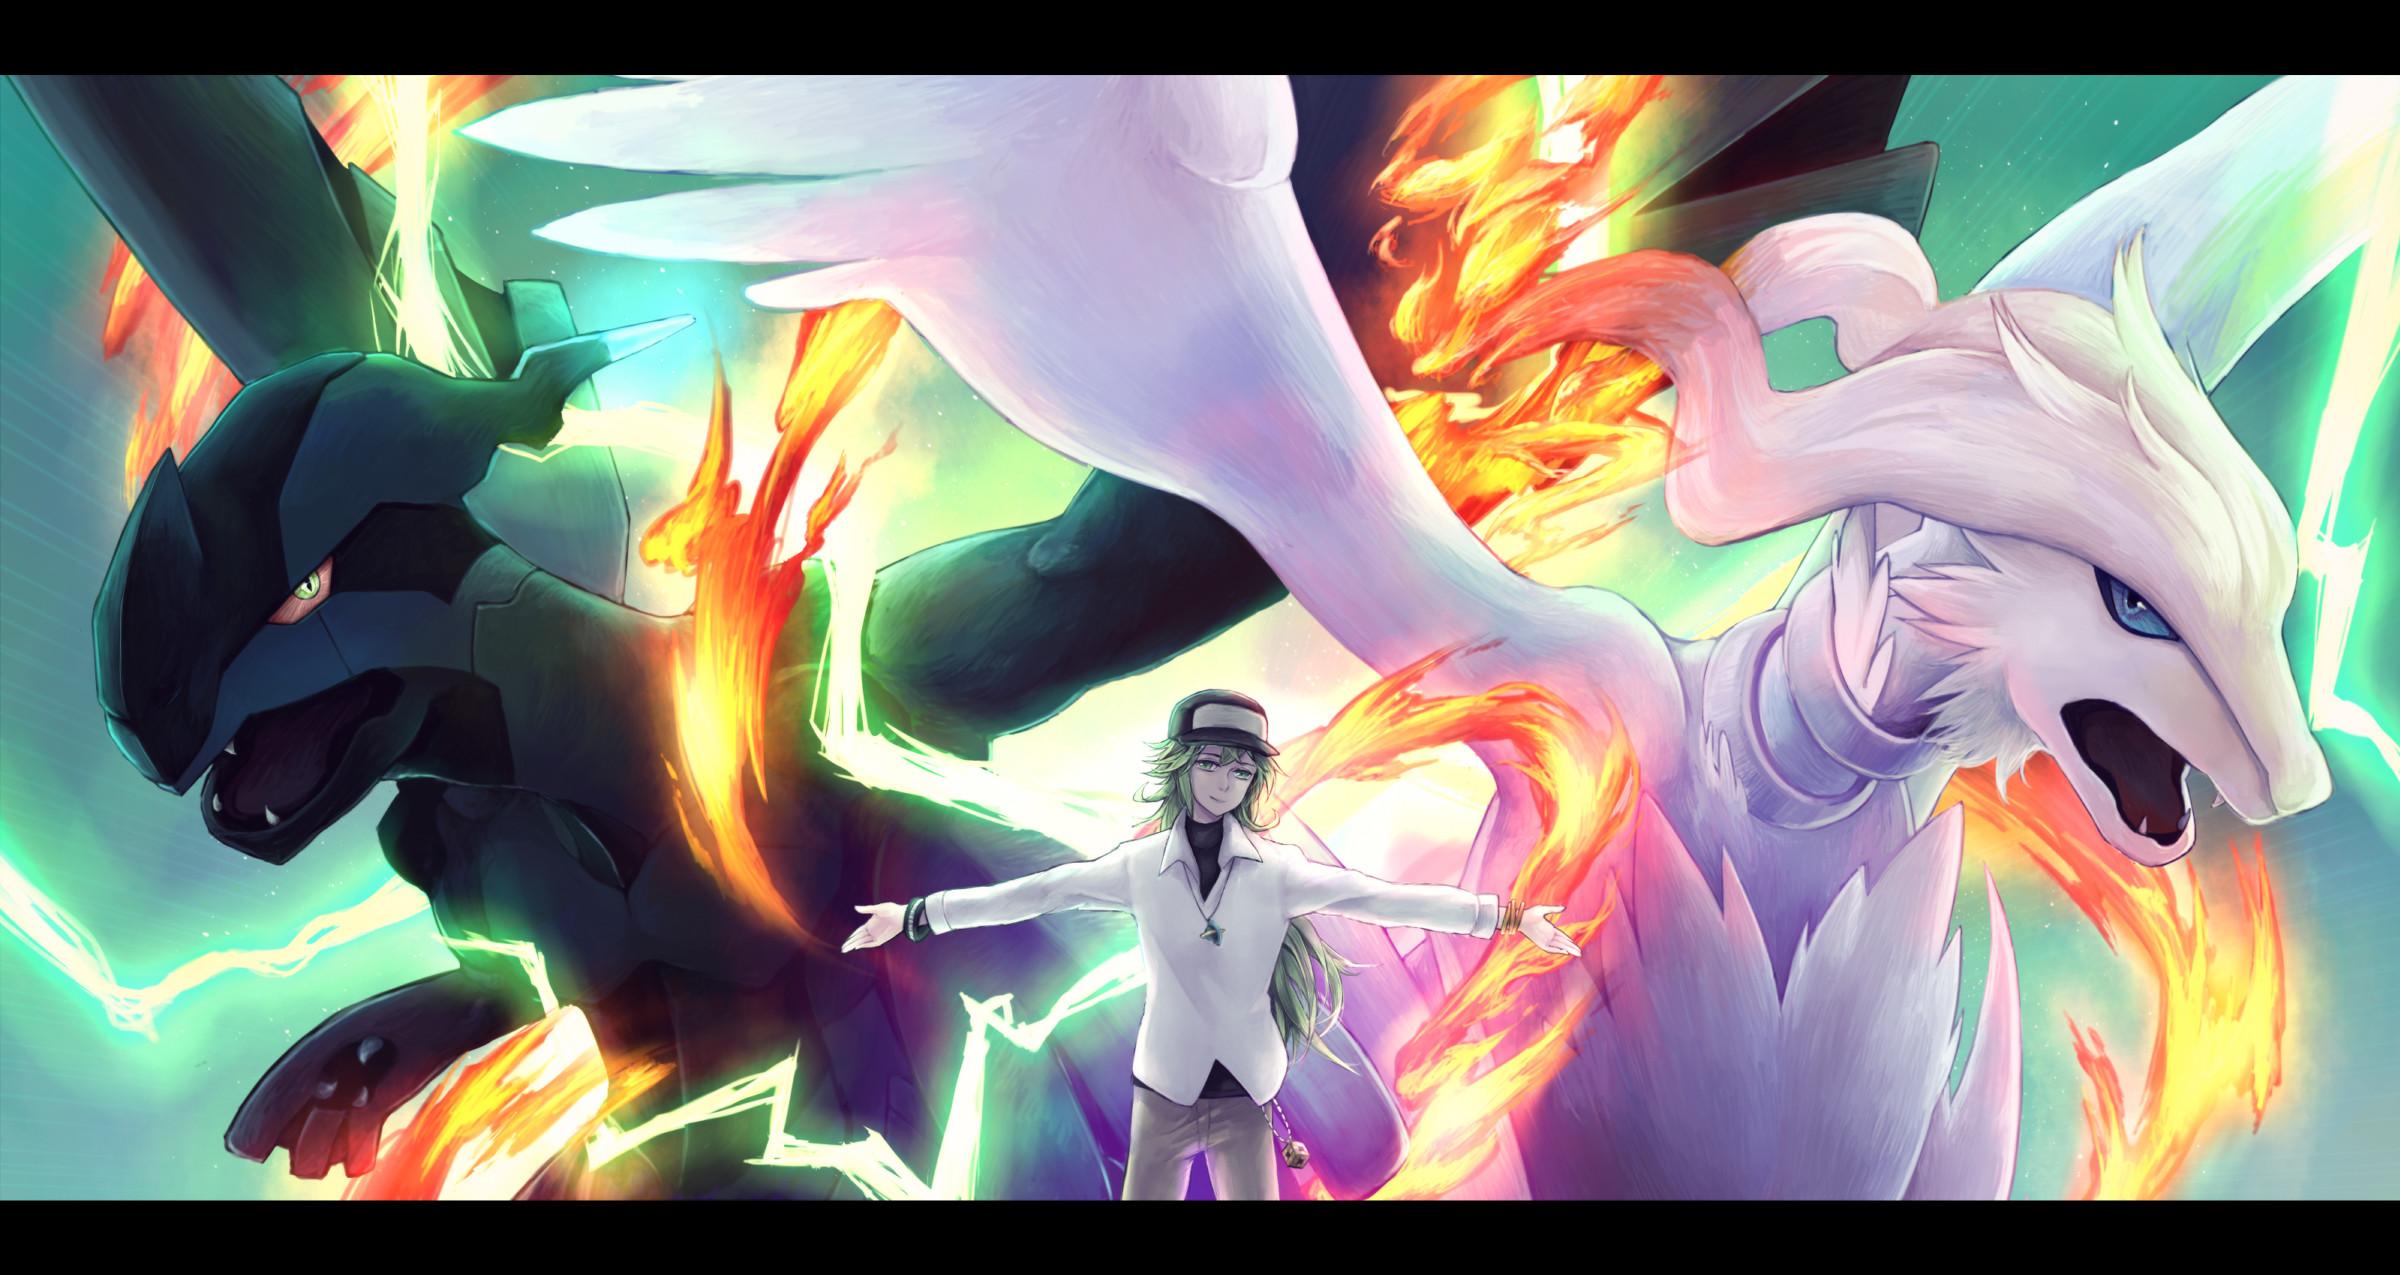 Res: 2400x1275, View Fullsize Pokémon Image